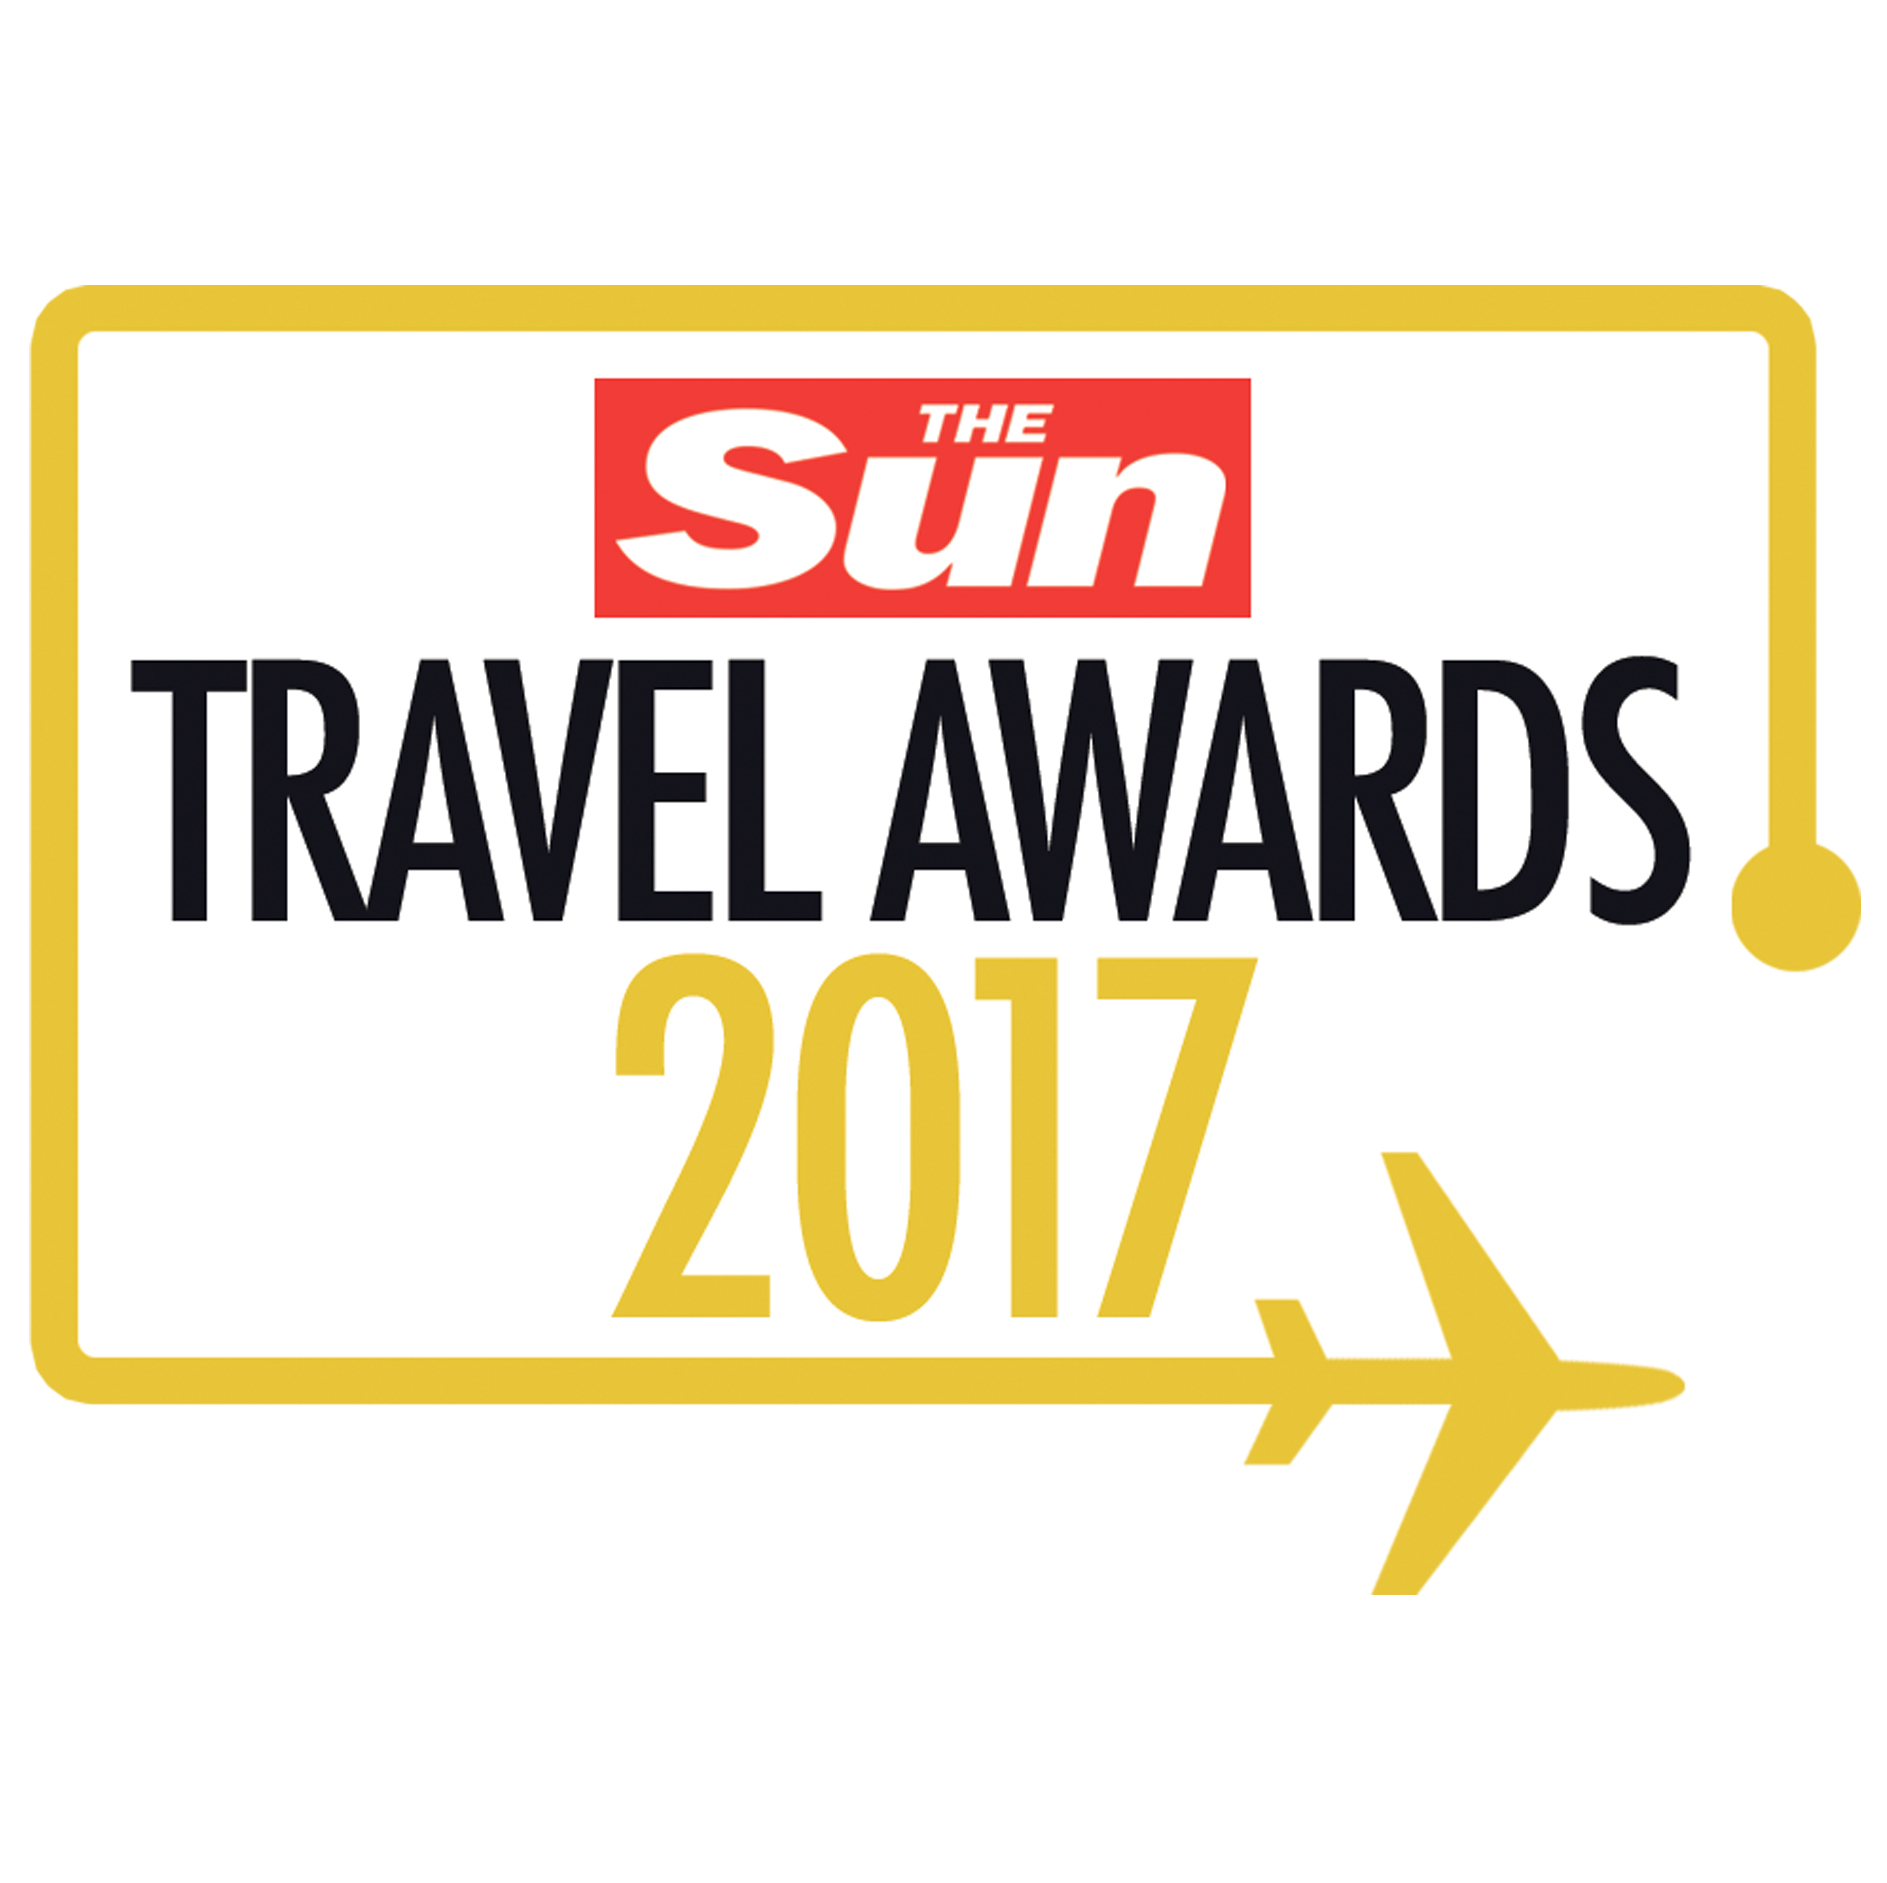 The Sun Travel Awards 2017 Winners